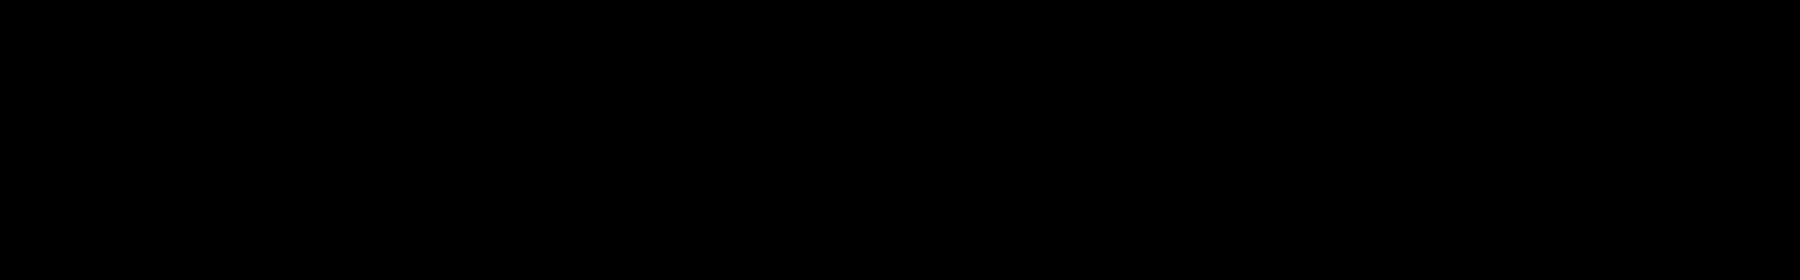 Riemann Deep Techno 2 audio waveform